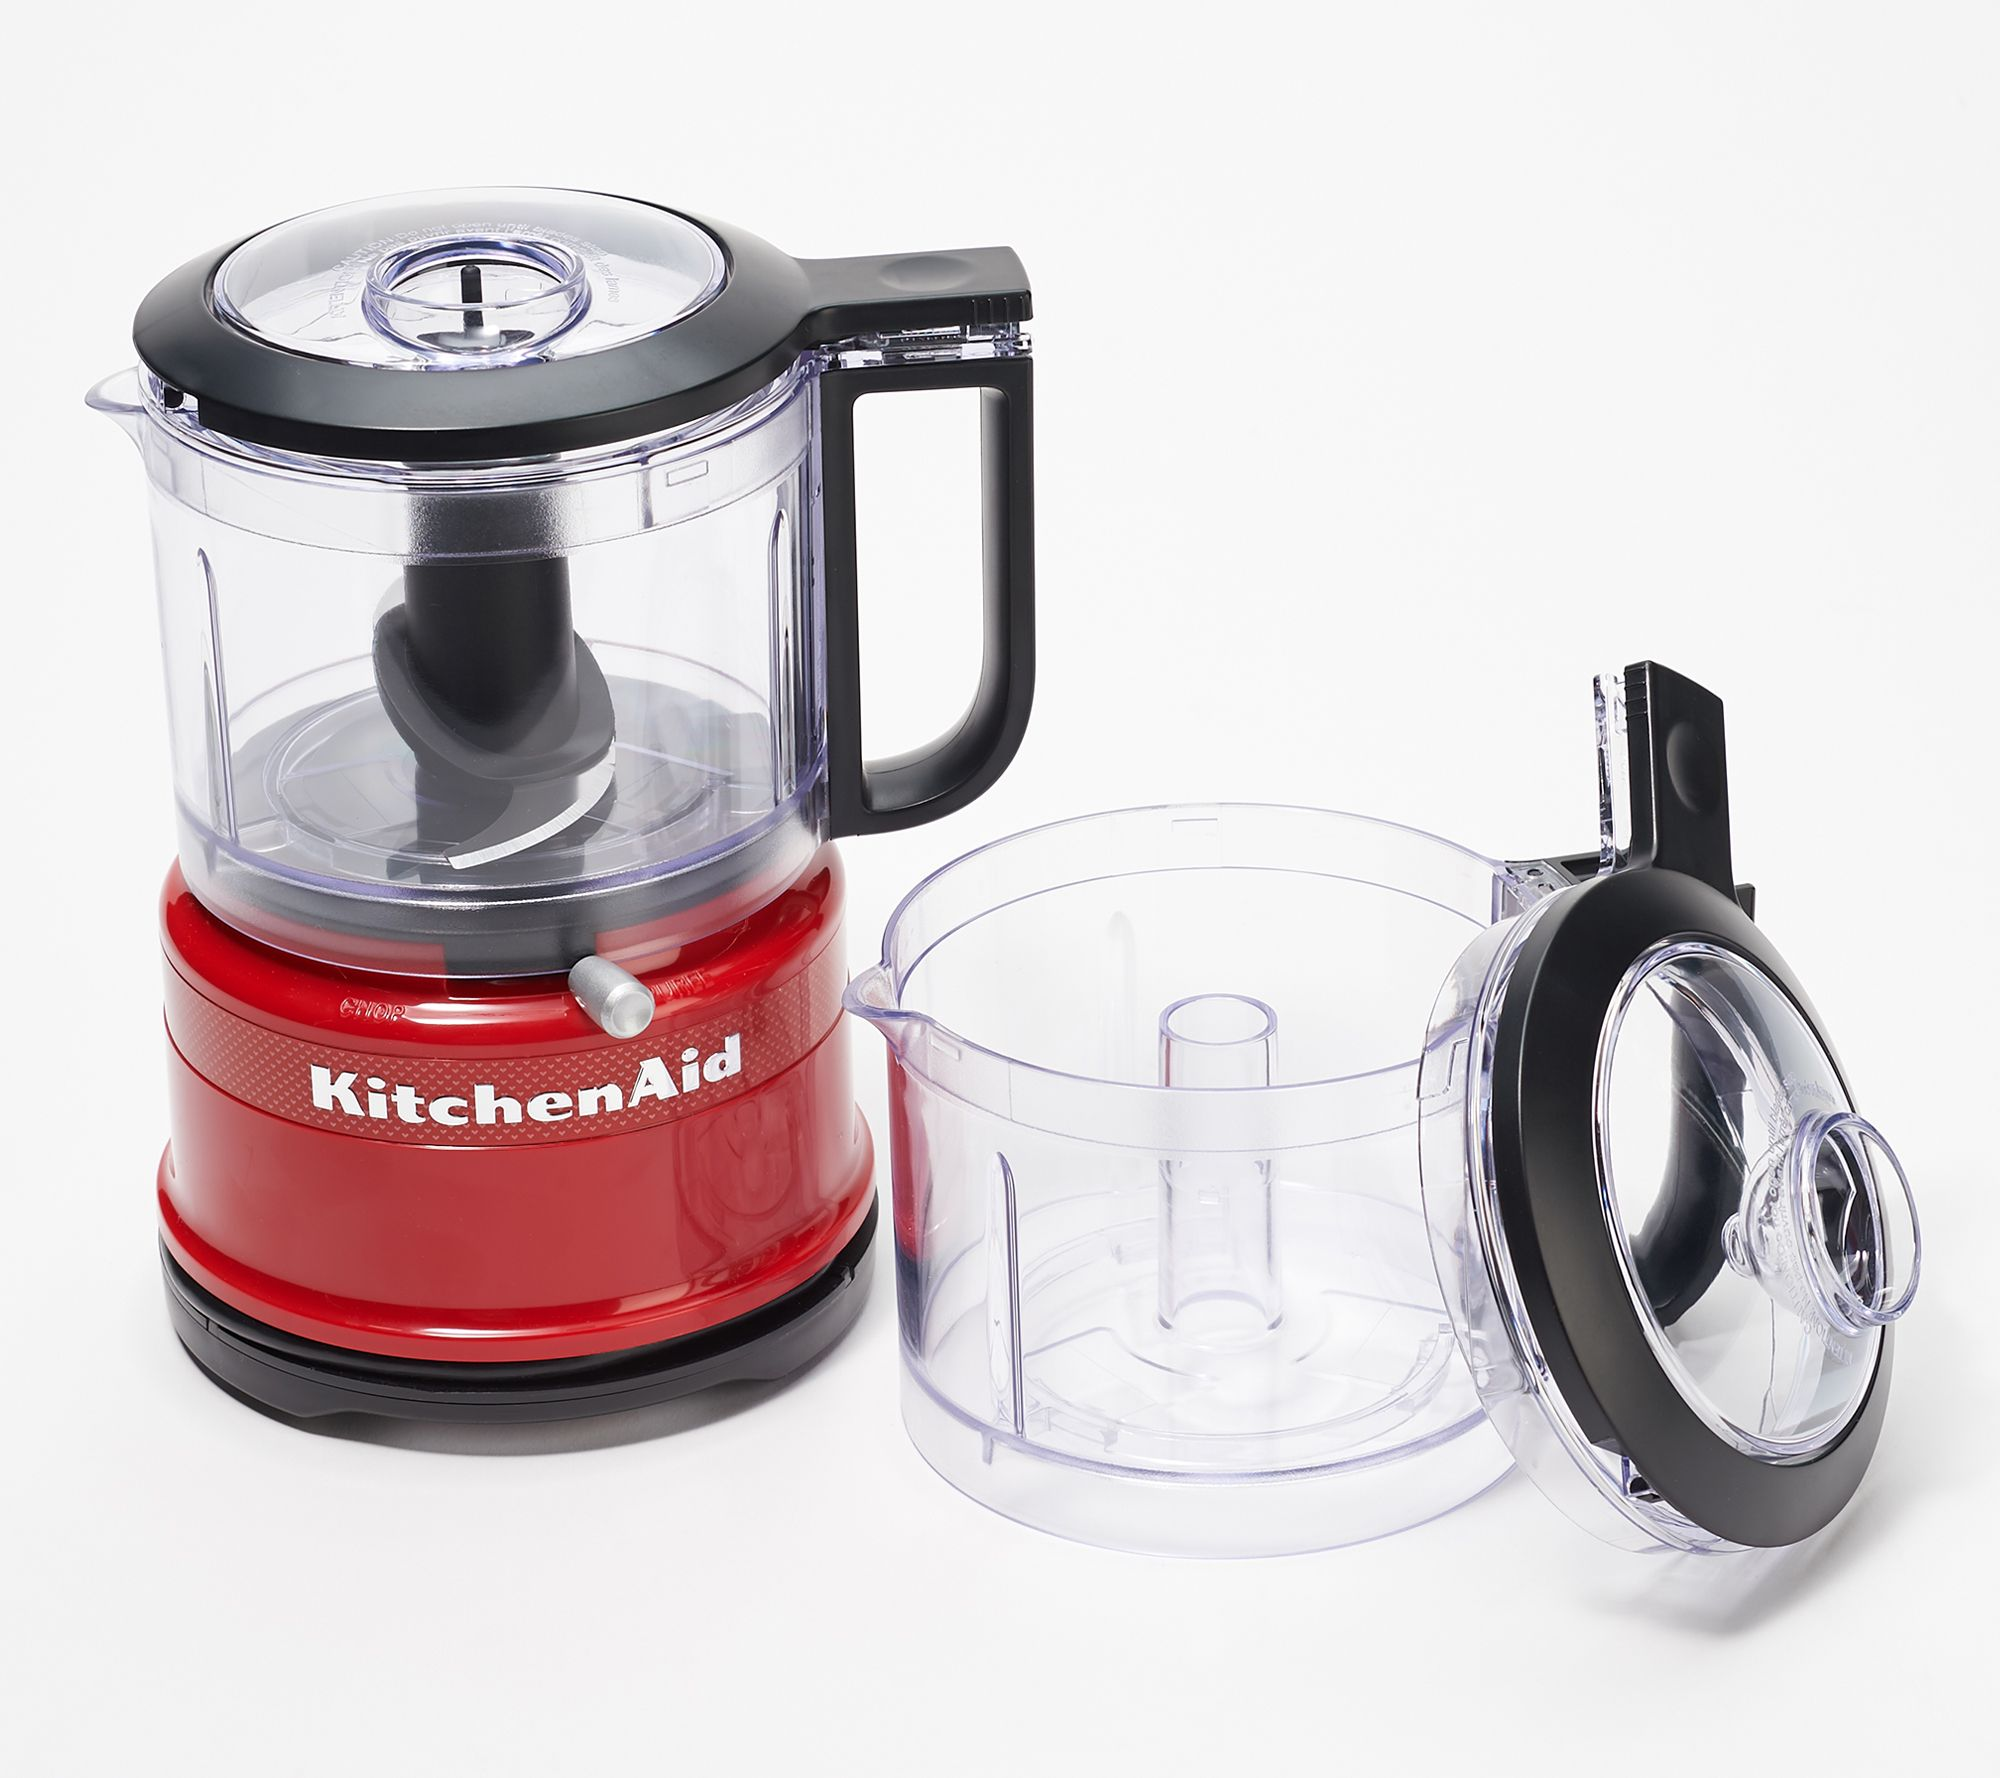 KitchenAid 100-Year Queen of Hearts 3.5 cup Food Chopper w/ Bowl — QVC.com